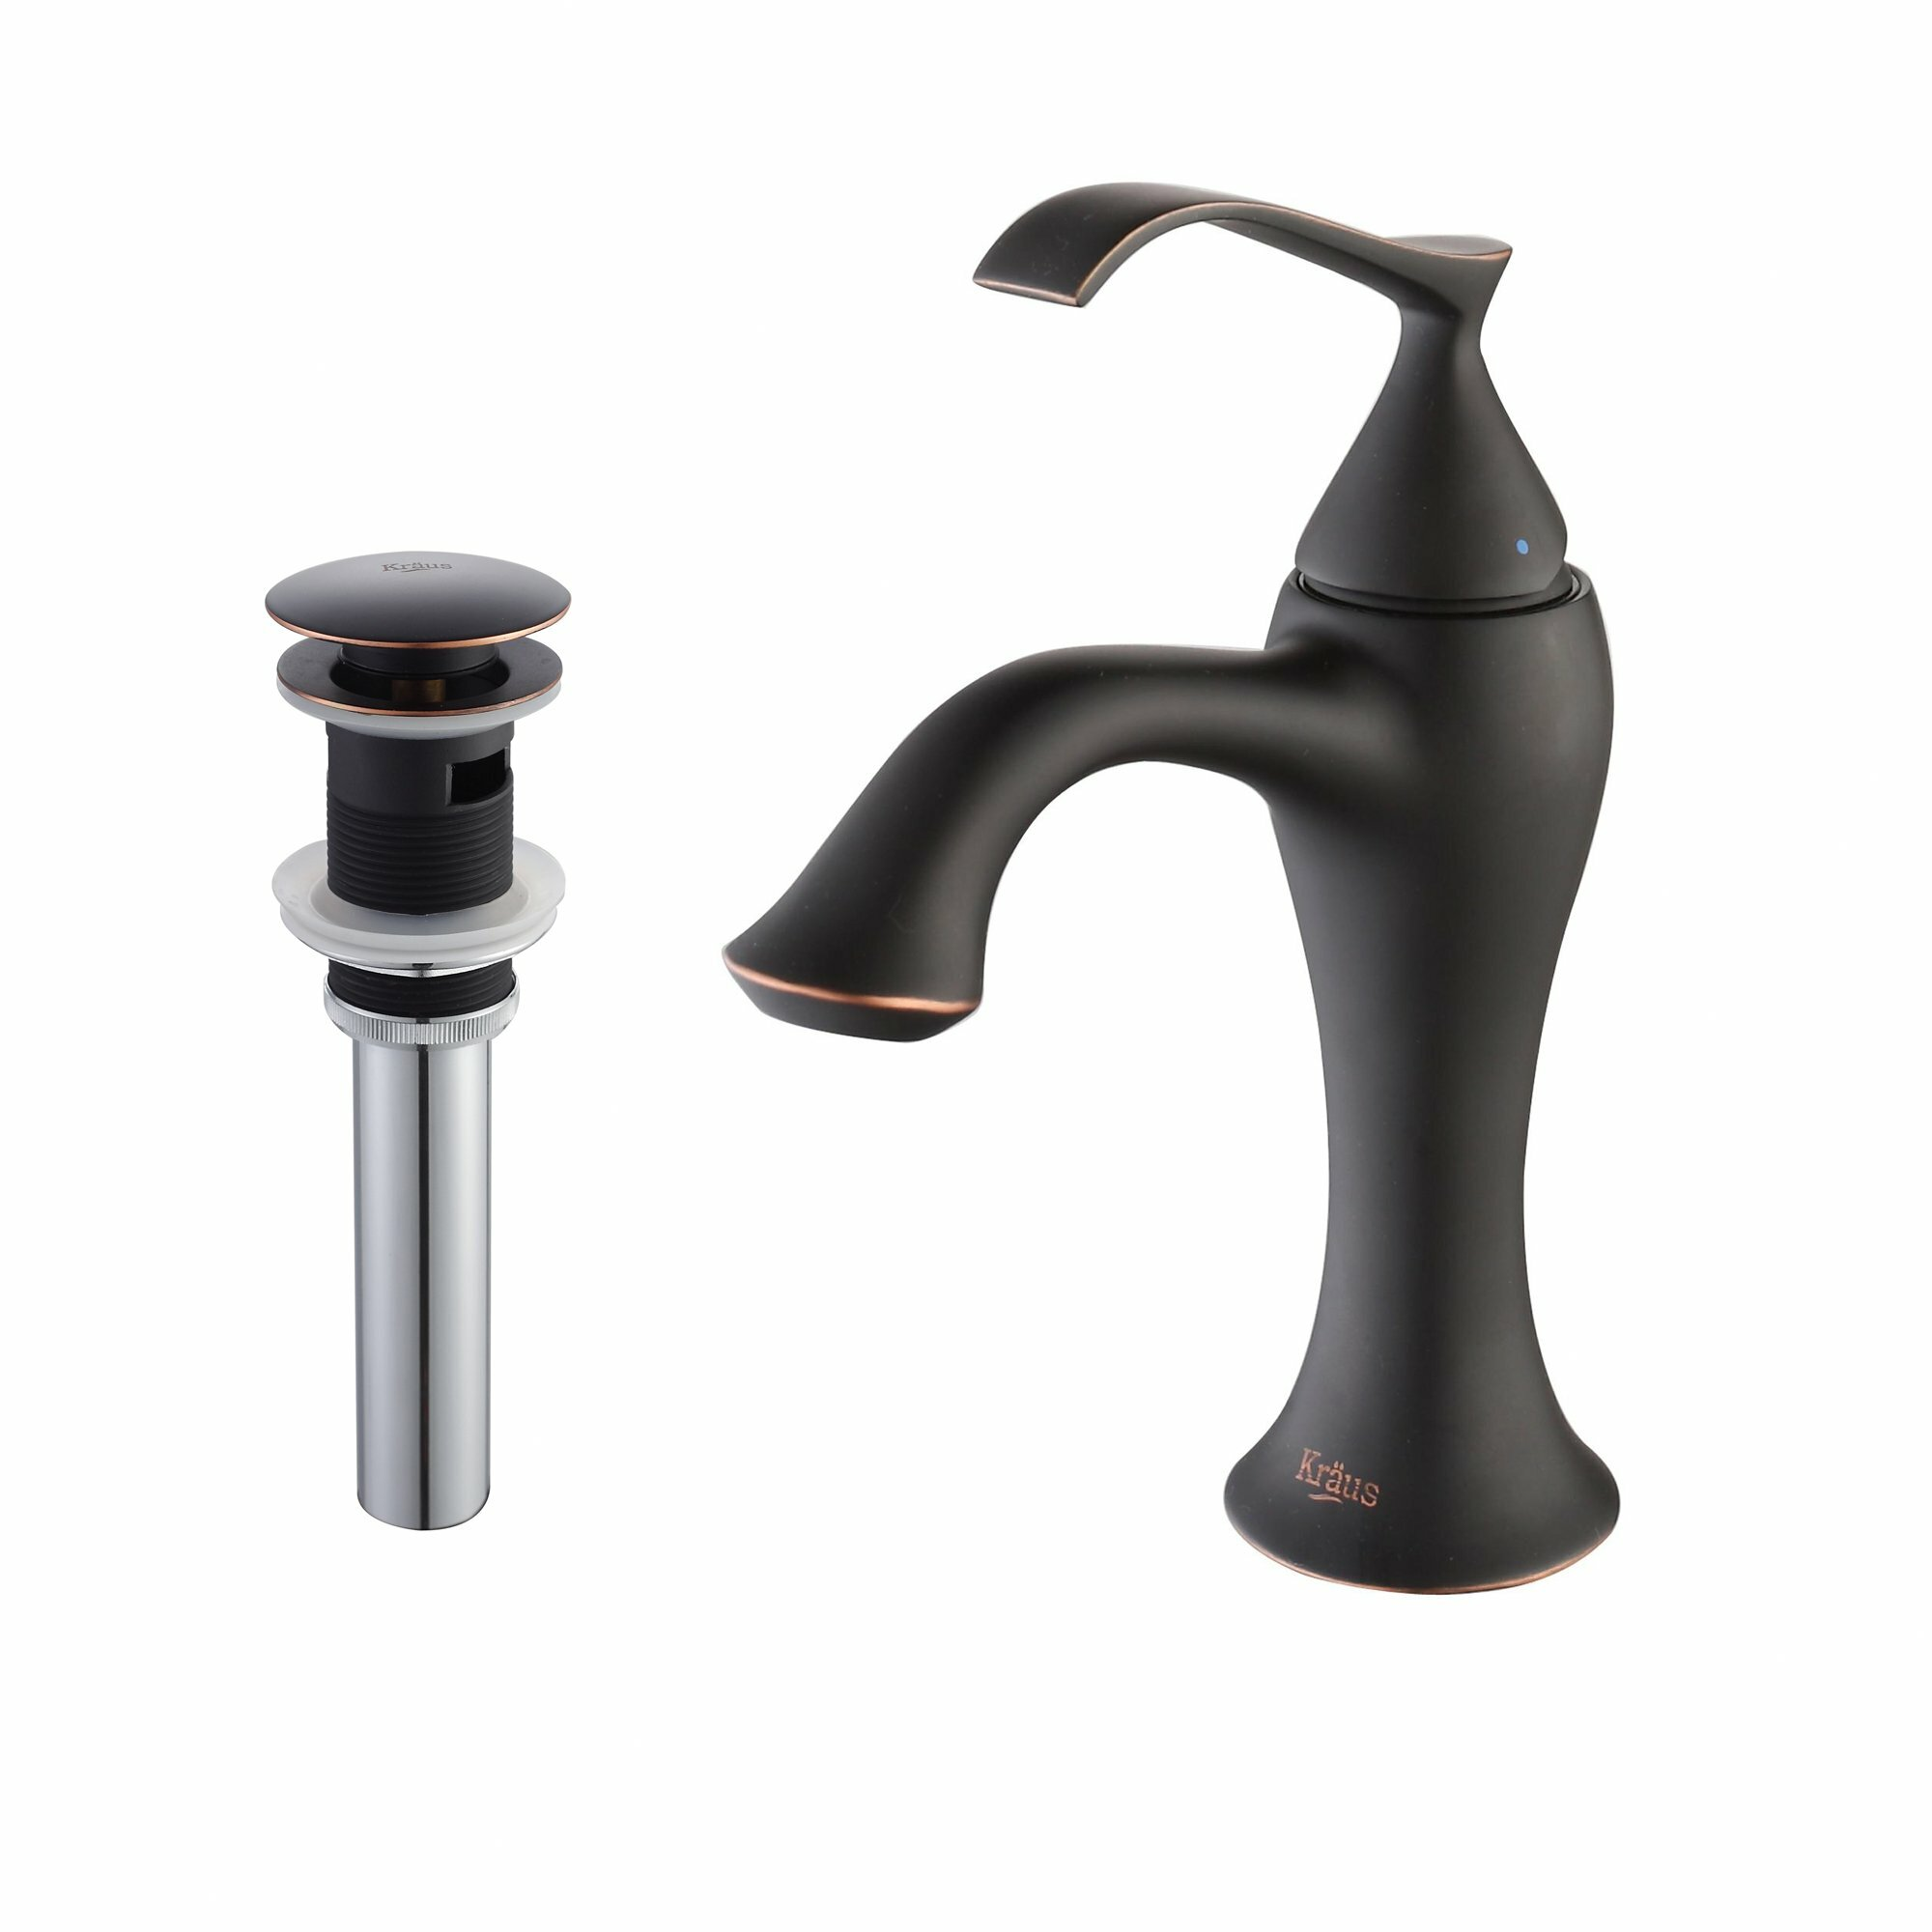 Kraus Faucets Reviews : Kraus Ventus Single Lever Basin Bathroom Faucet & Pop Up Drain with ...